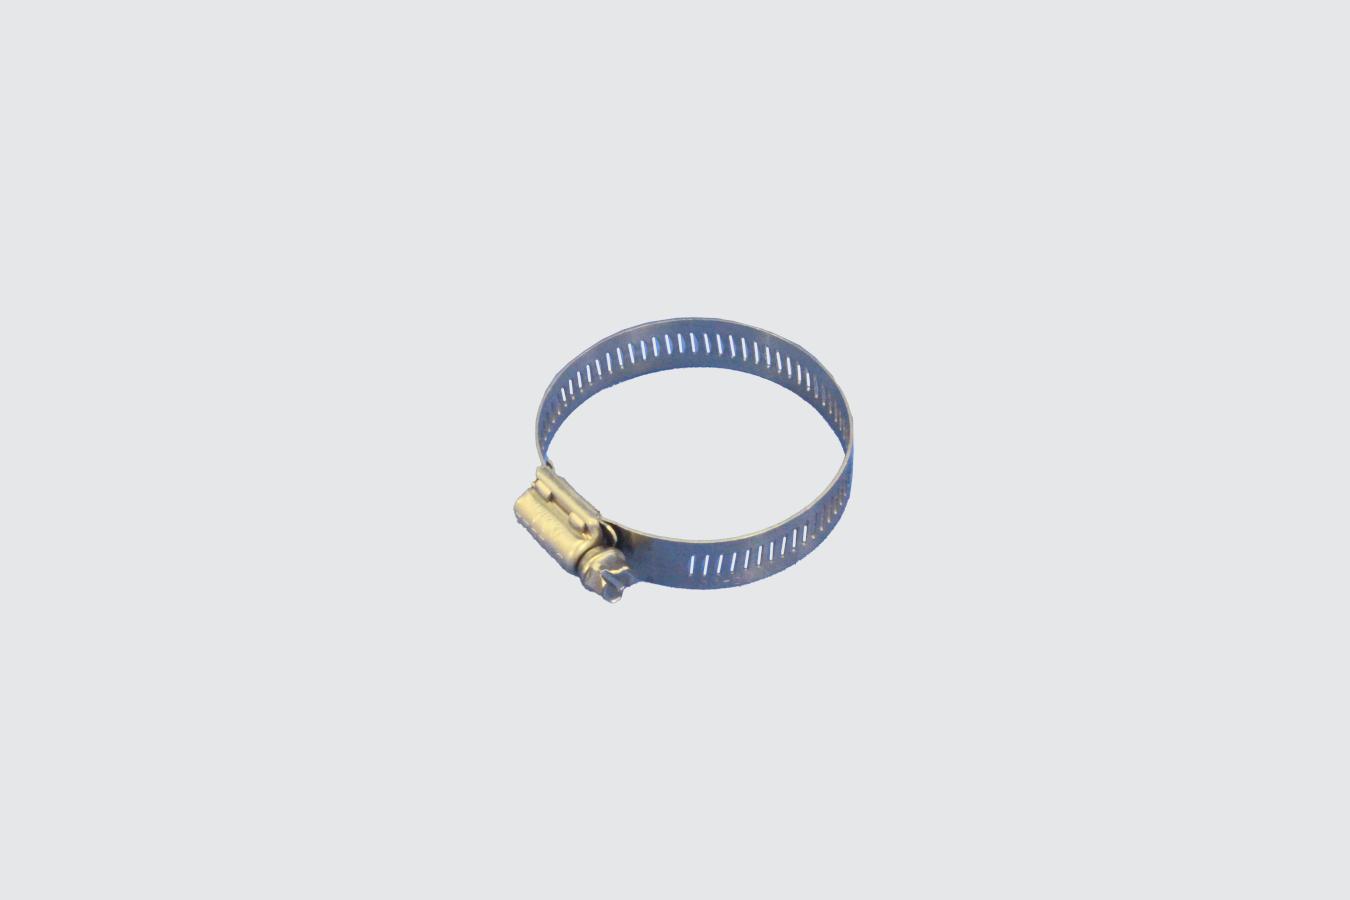 35221662-CLAMP, 1.3125-2.25 ID WORM GEAR ZINC